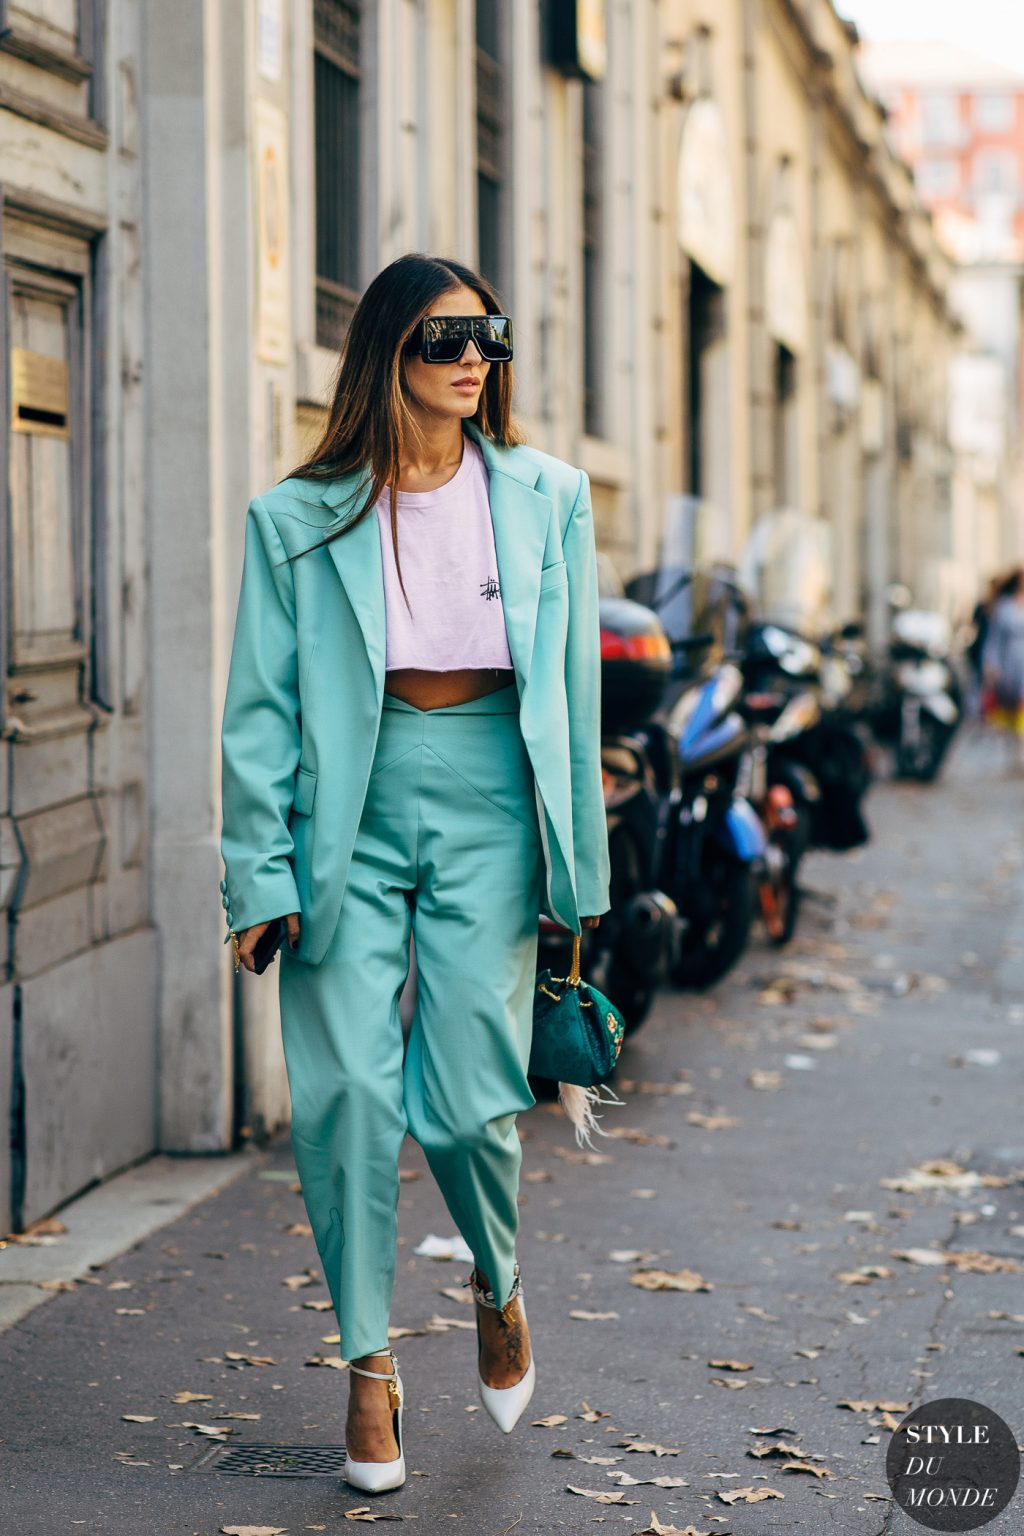 Gilda Ambrossio blazer xanh ngọc kính mát oversize giày cao gót